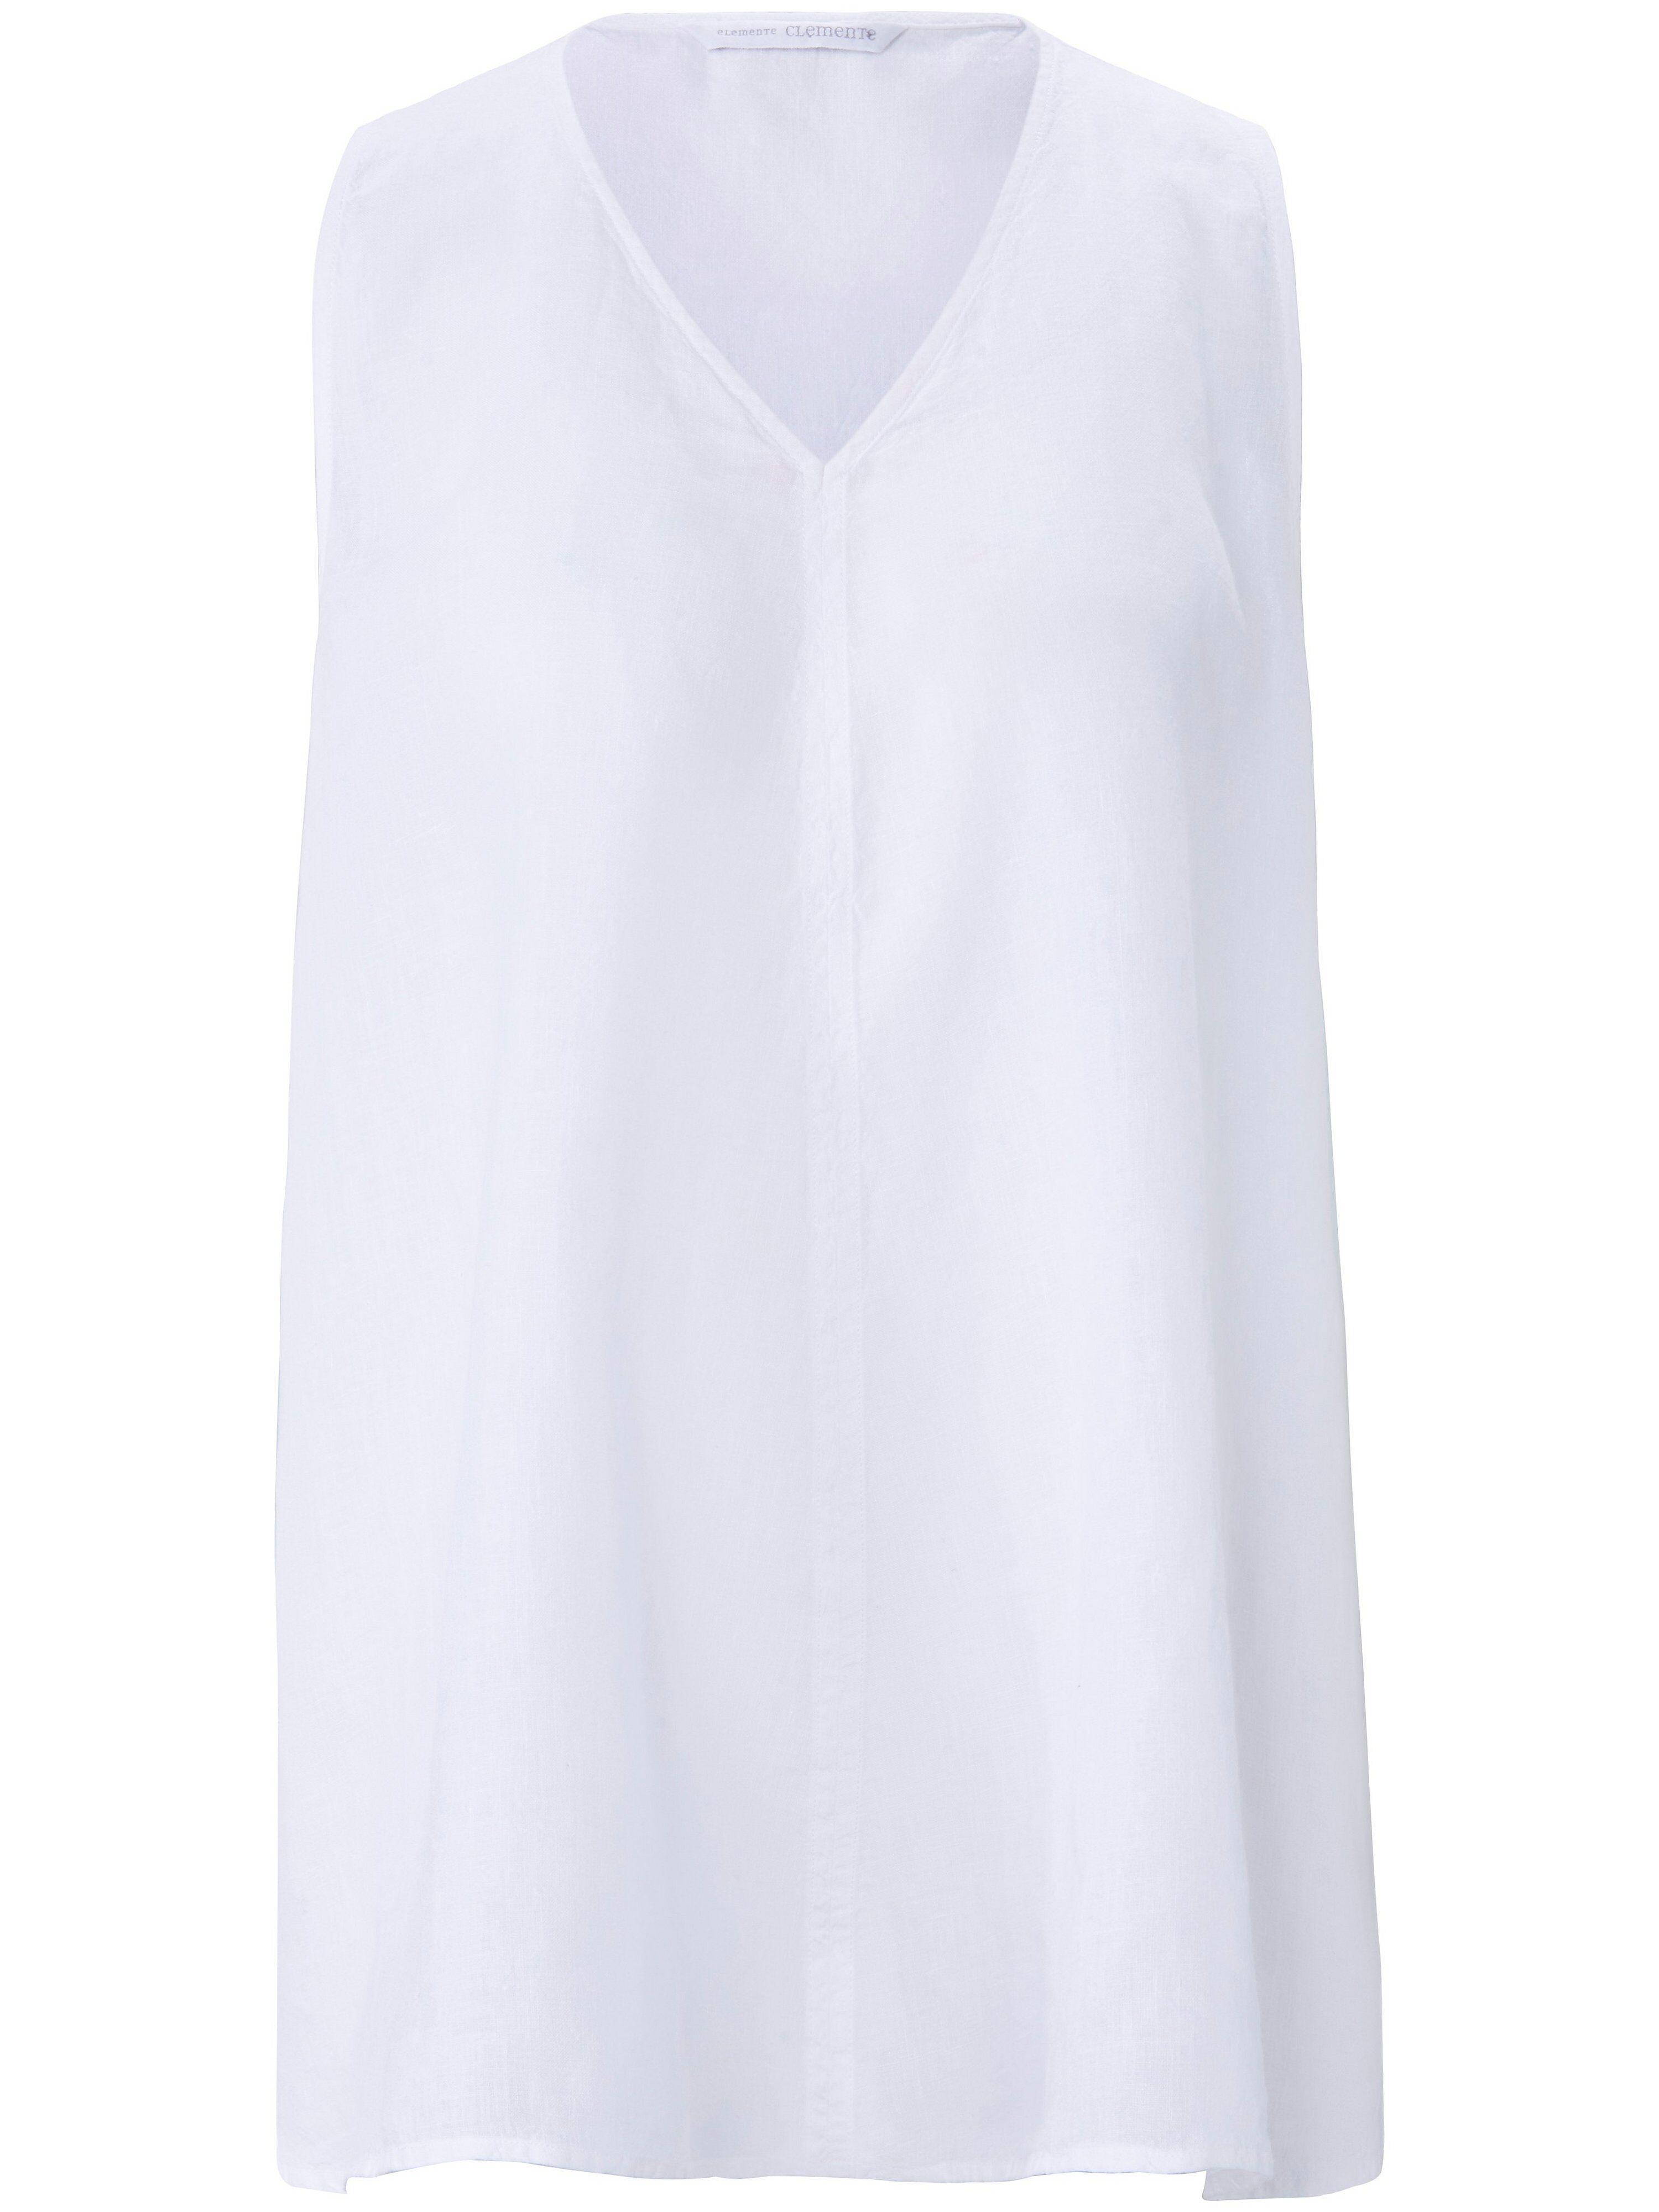 elemente clemente Le top 100% lin  elemente clemente blanc  - Femme - 38